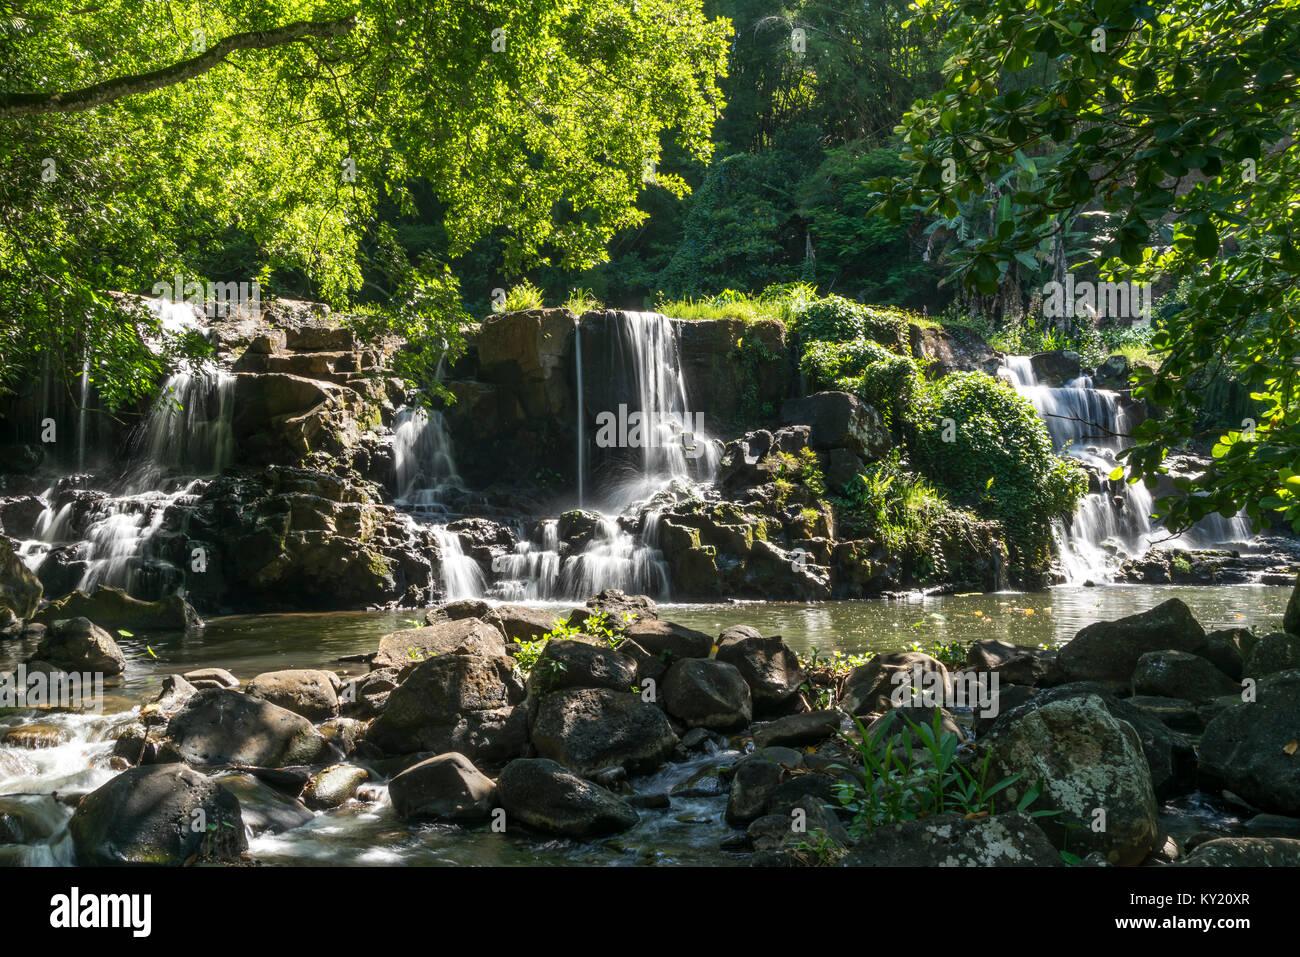 Wasserfall Im Park Des Eureka House / Maison Eureka In Moka, Mauritius,  Afrika |